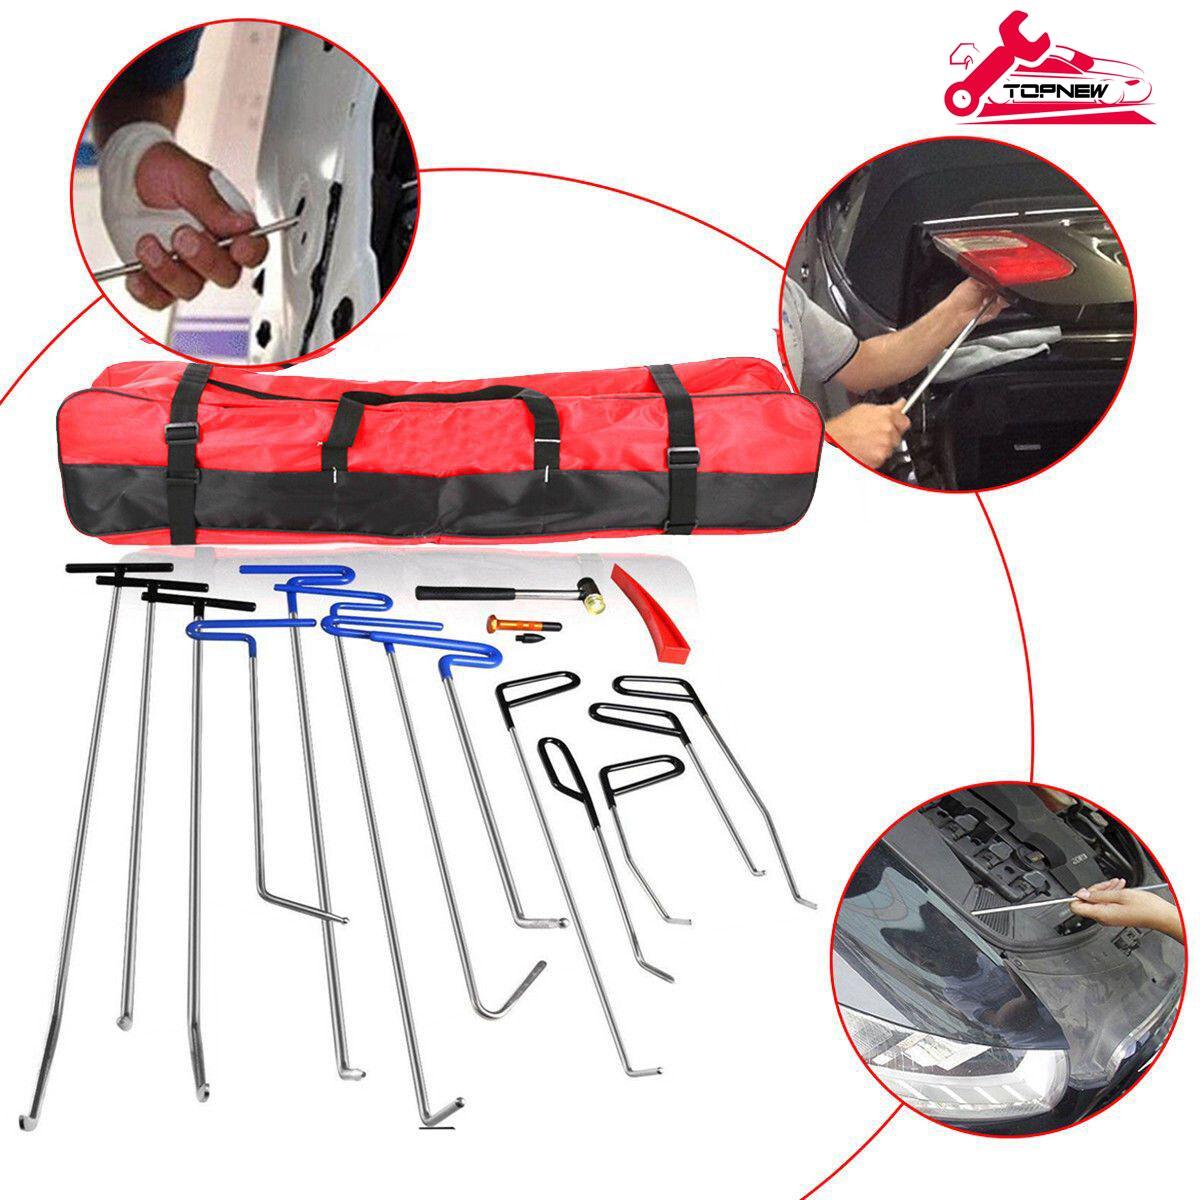 Paintless Dent Removal Rods Hooks Hammer Car Dent Remover Kit Glue Stick Removal Hail Rods Tool Set